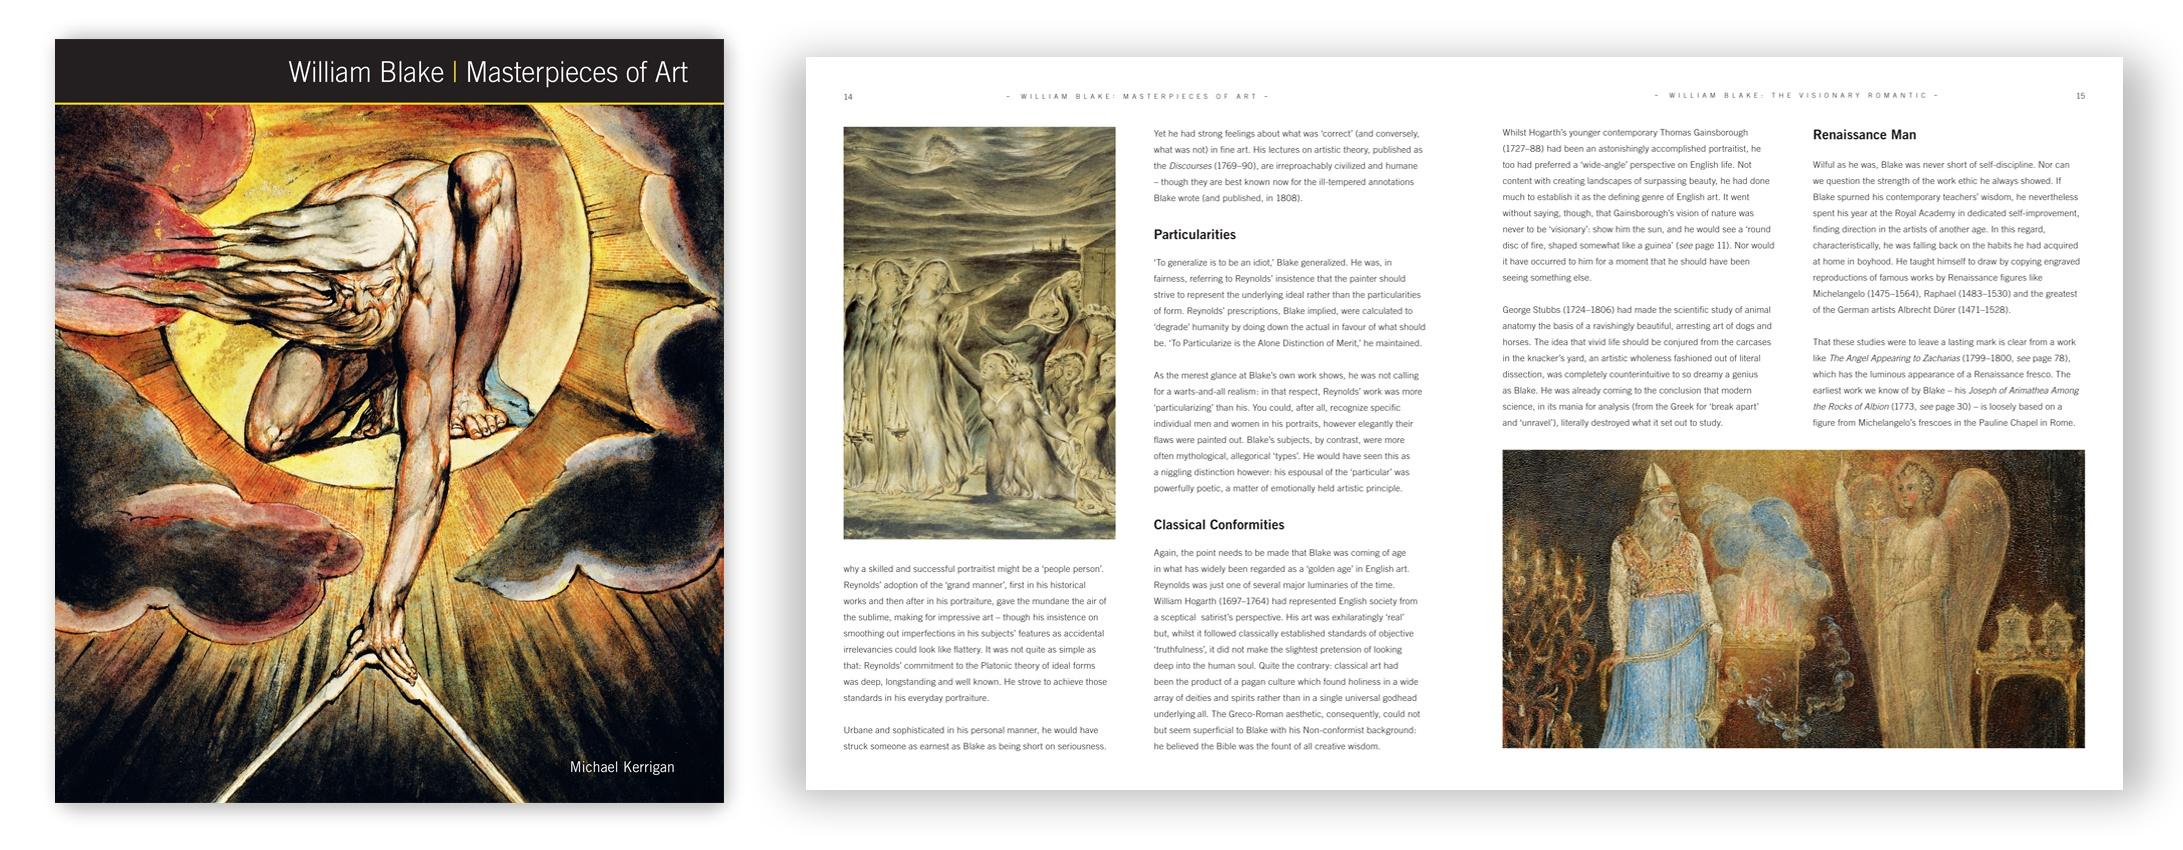 Masterpieces of Art - william blake w- Spread